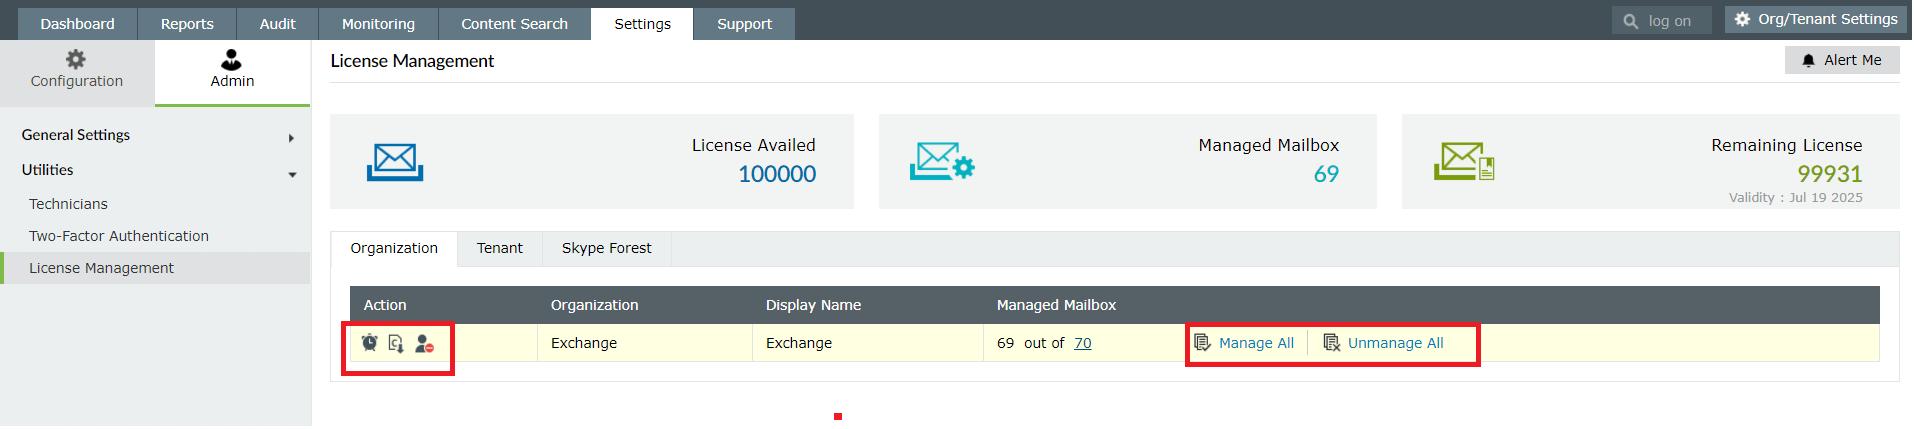 license-management-in-exchange-server